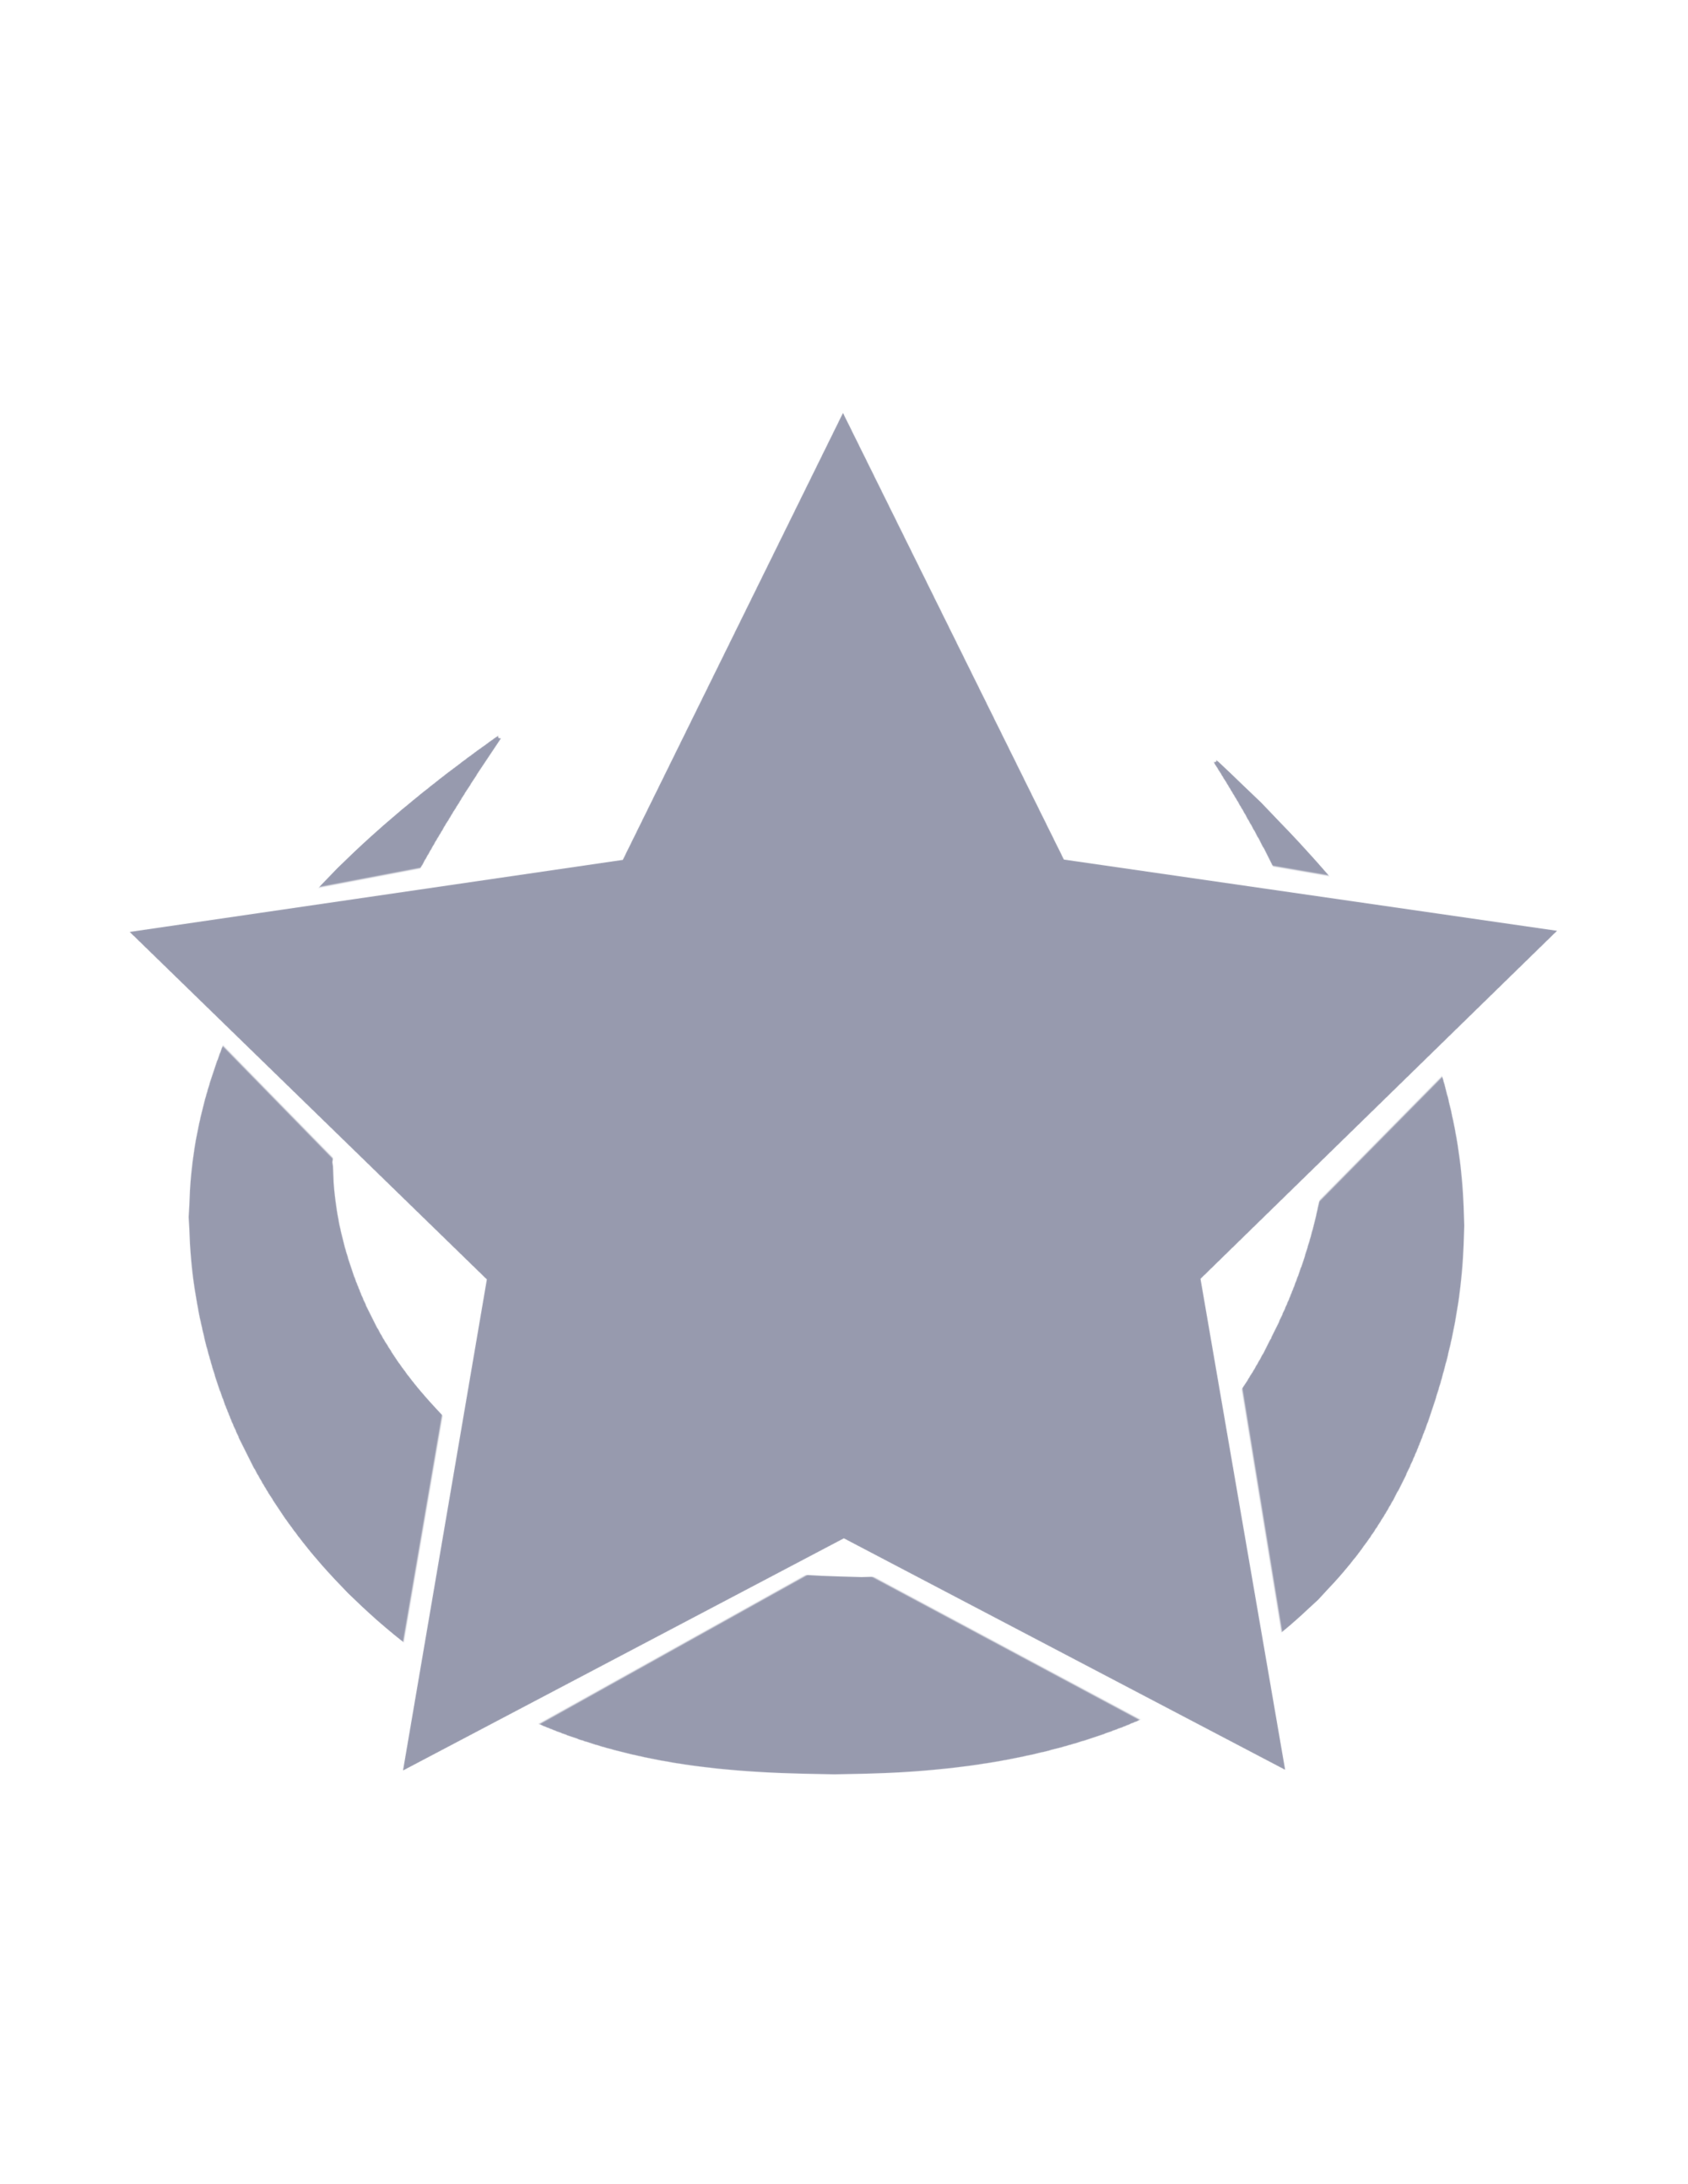 luna shad wikipedia